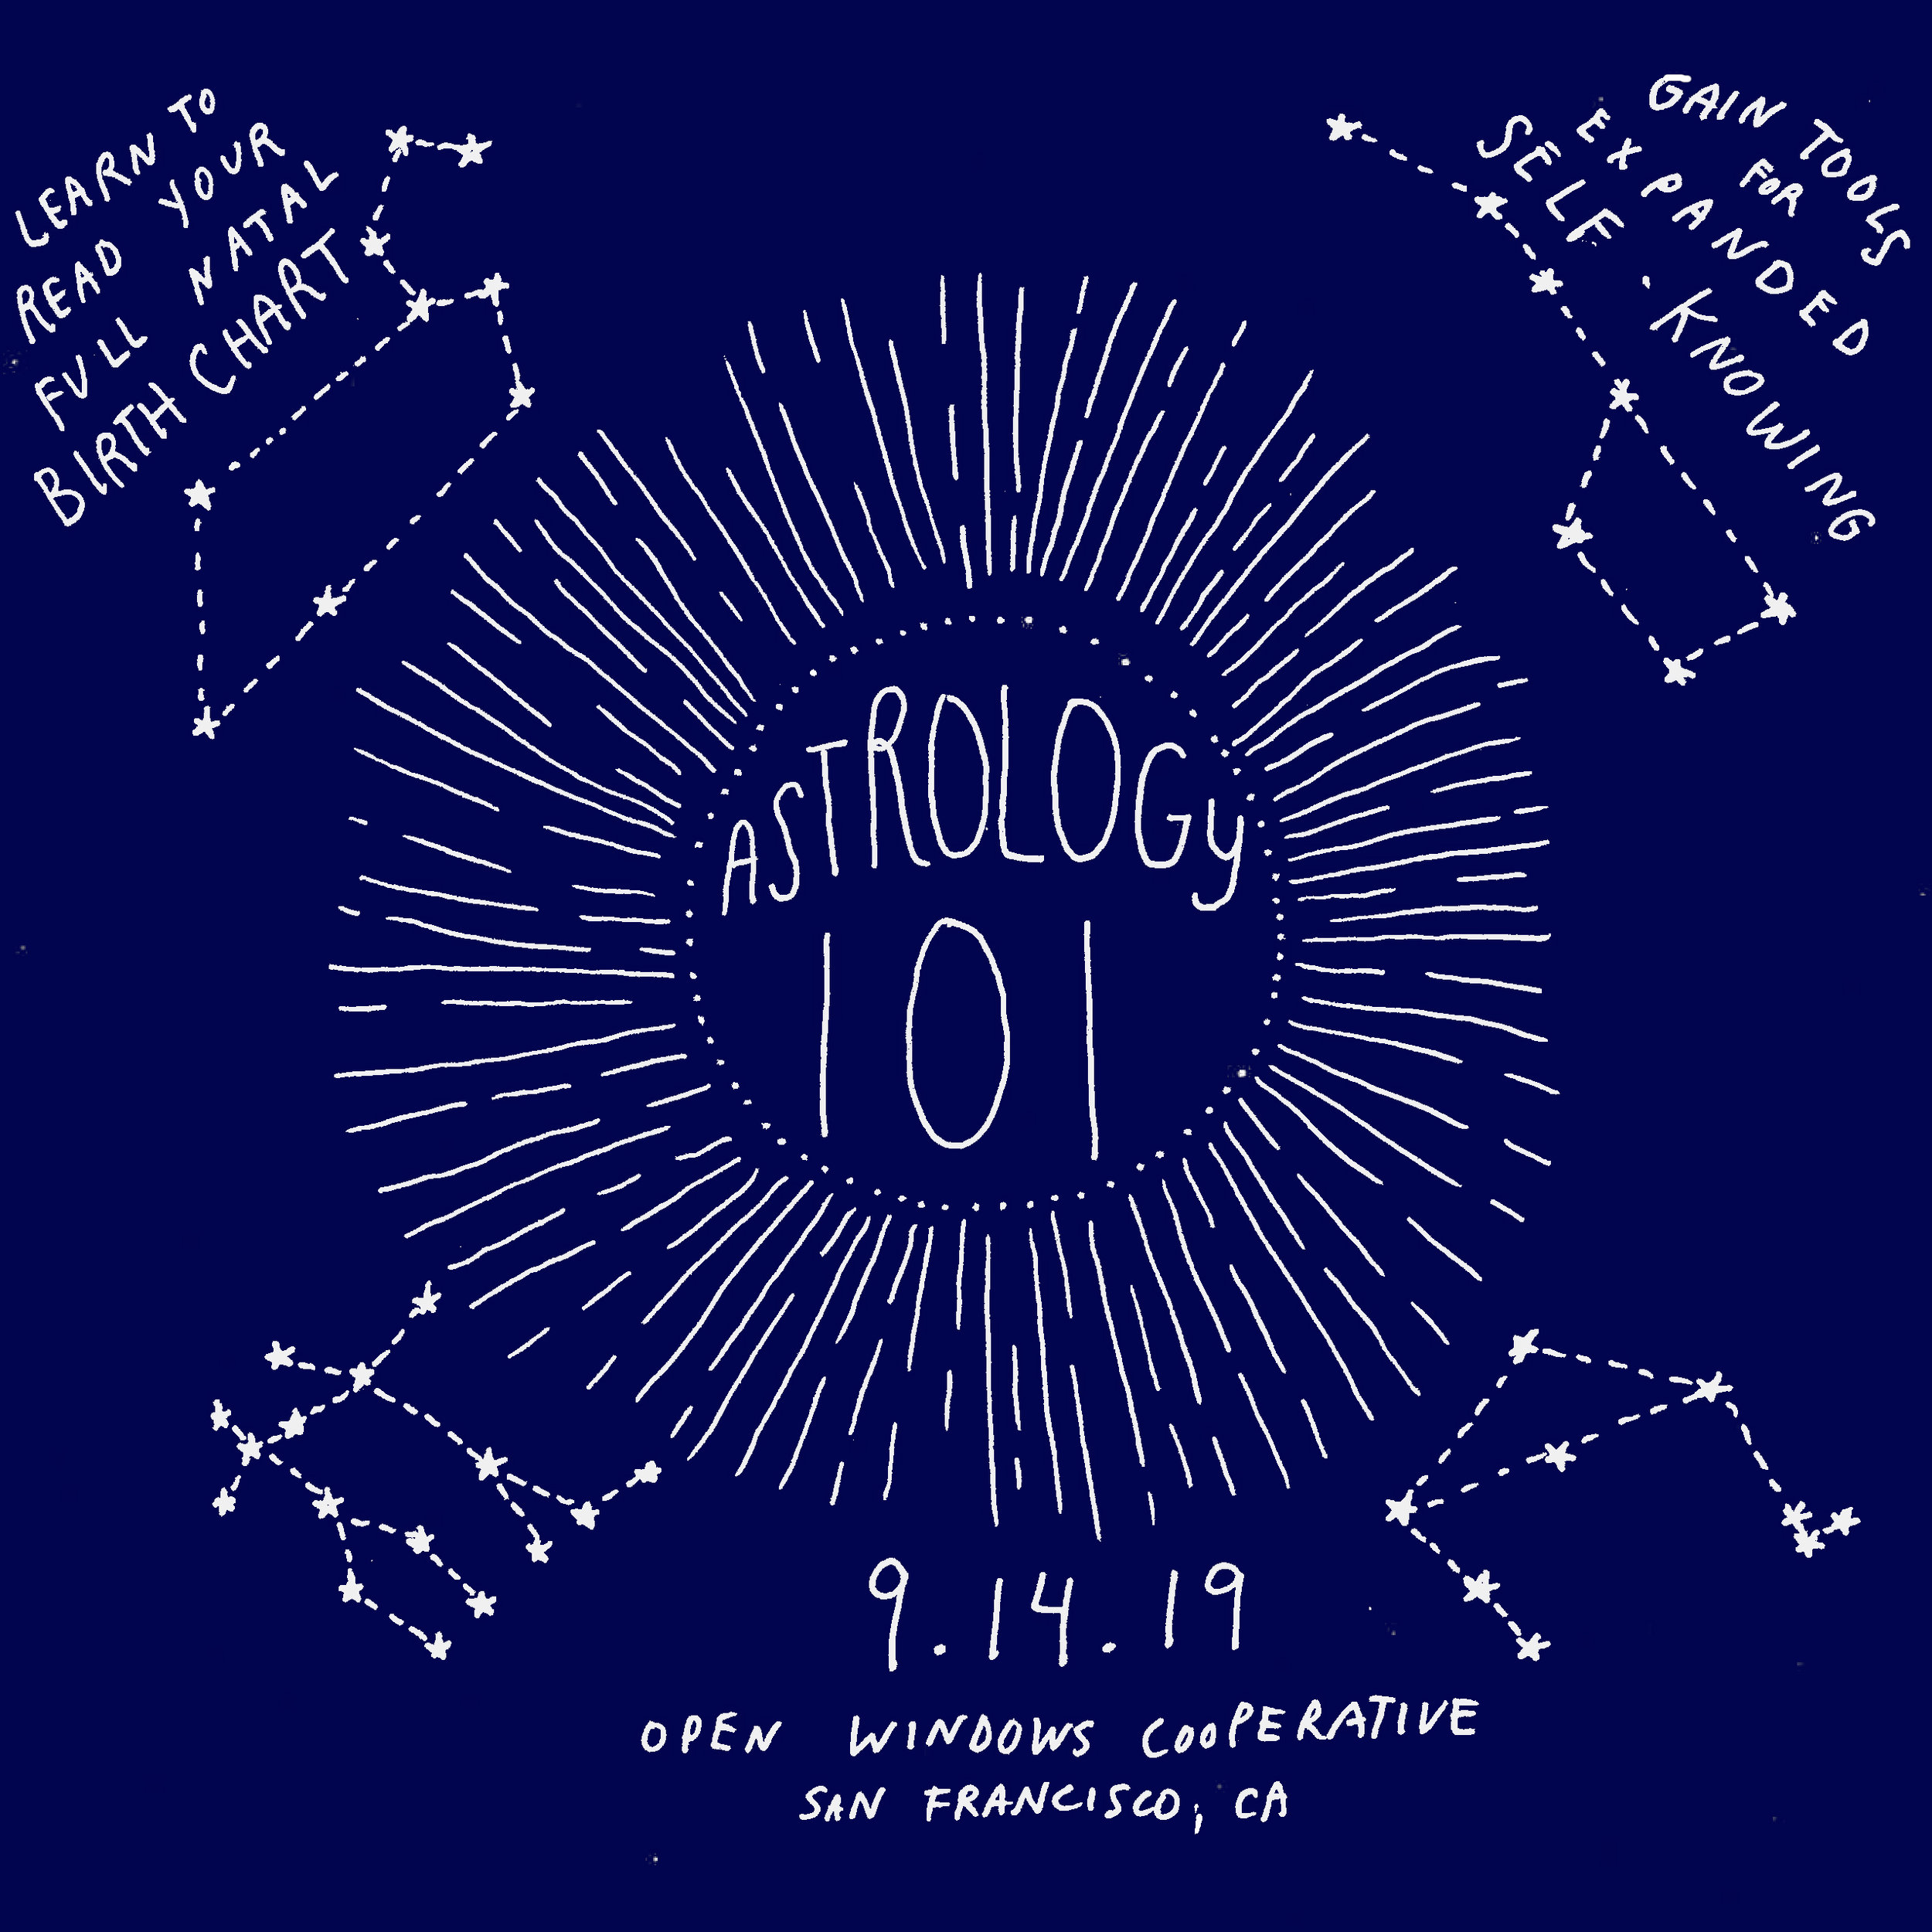 astro3 (2).jpg